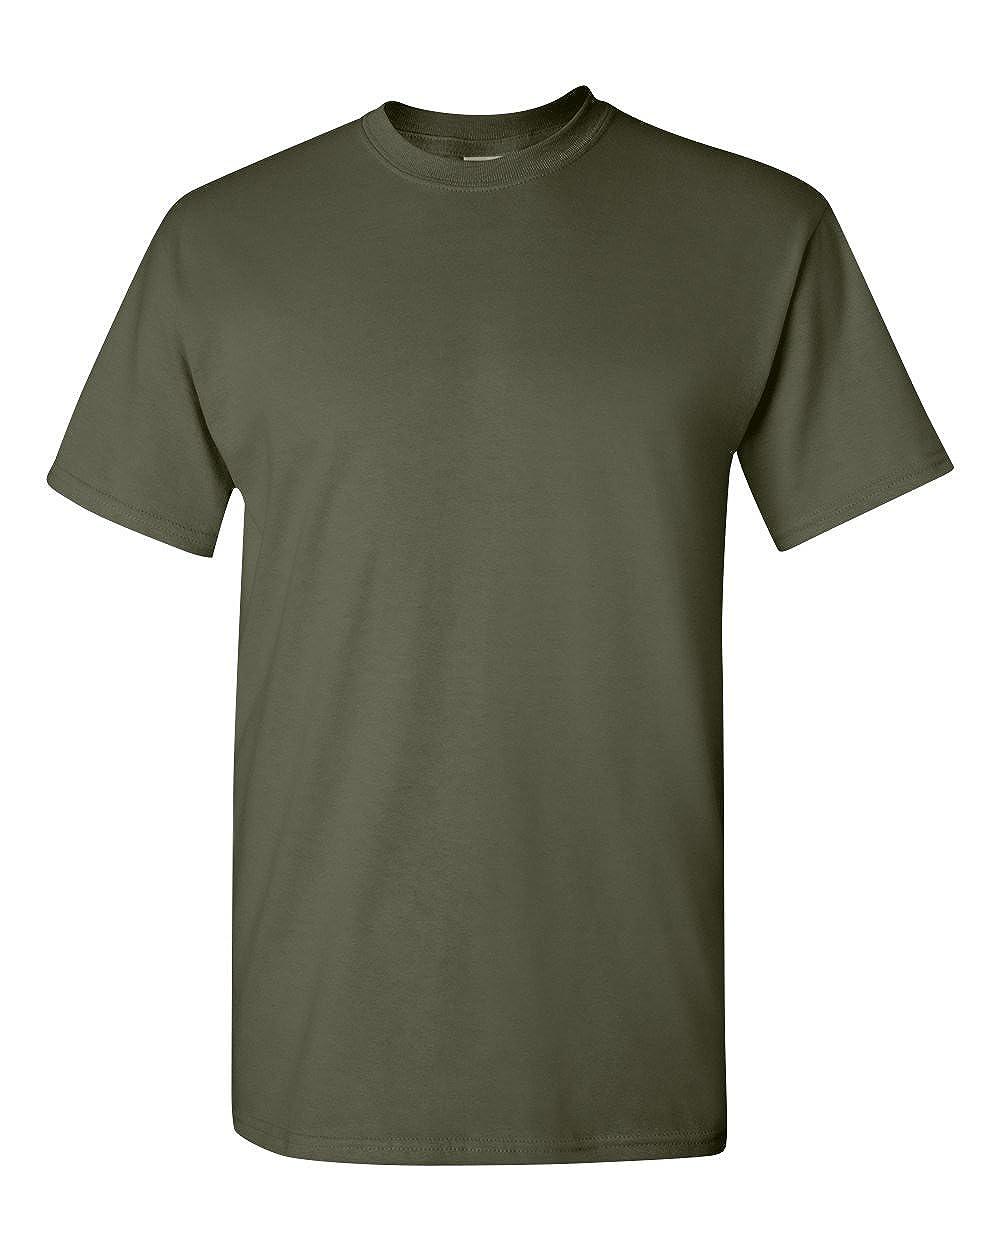 Military Green Gildan Heavy Cotton T-Shirt XXX-Large